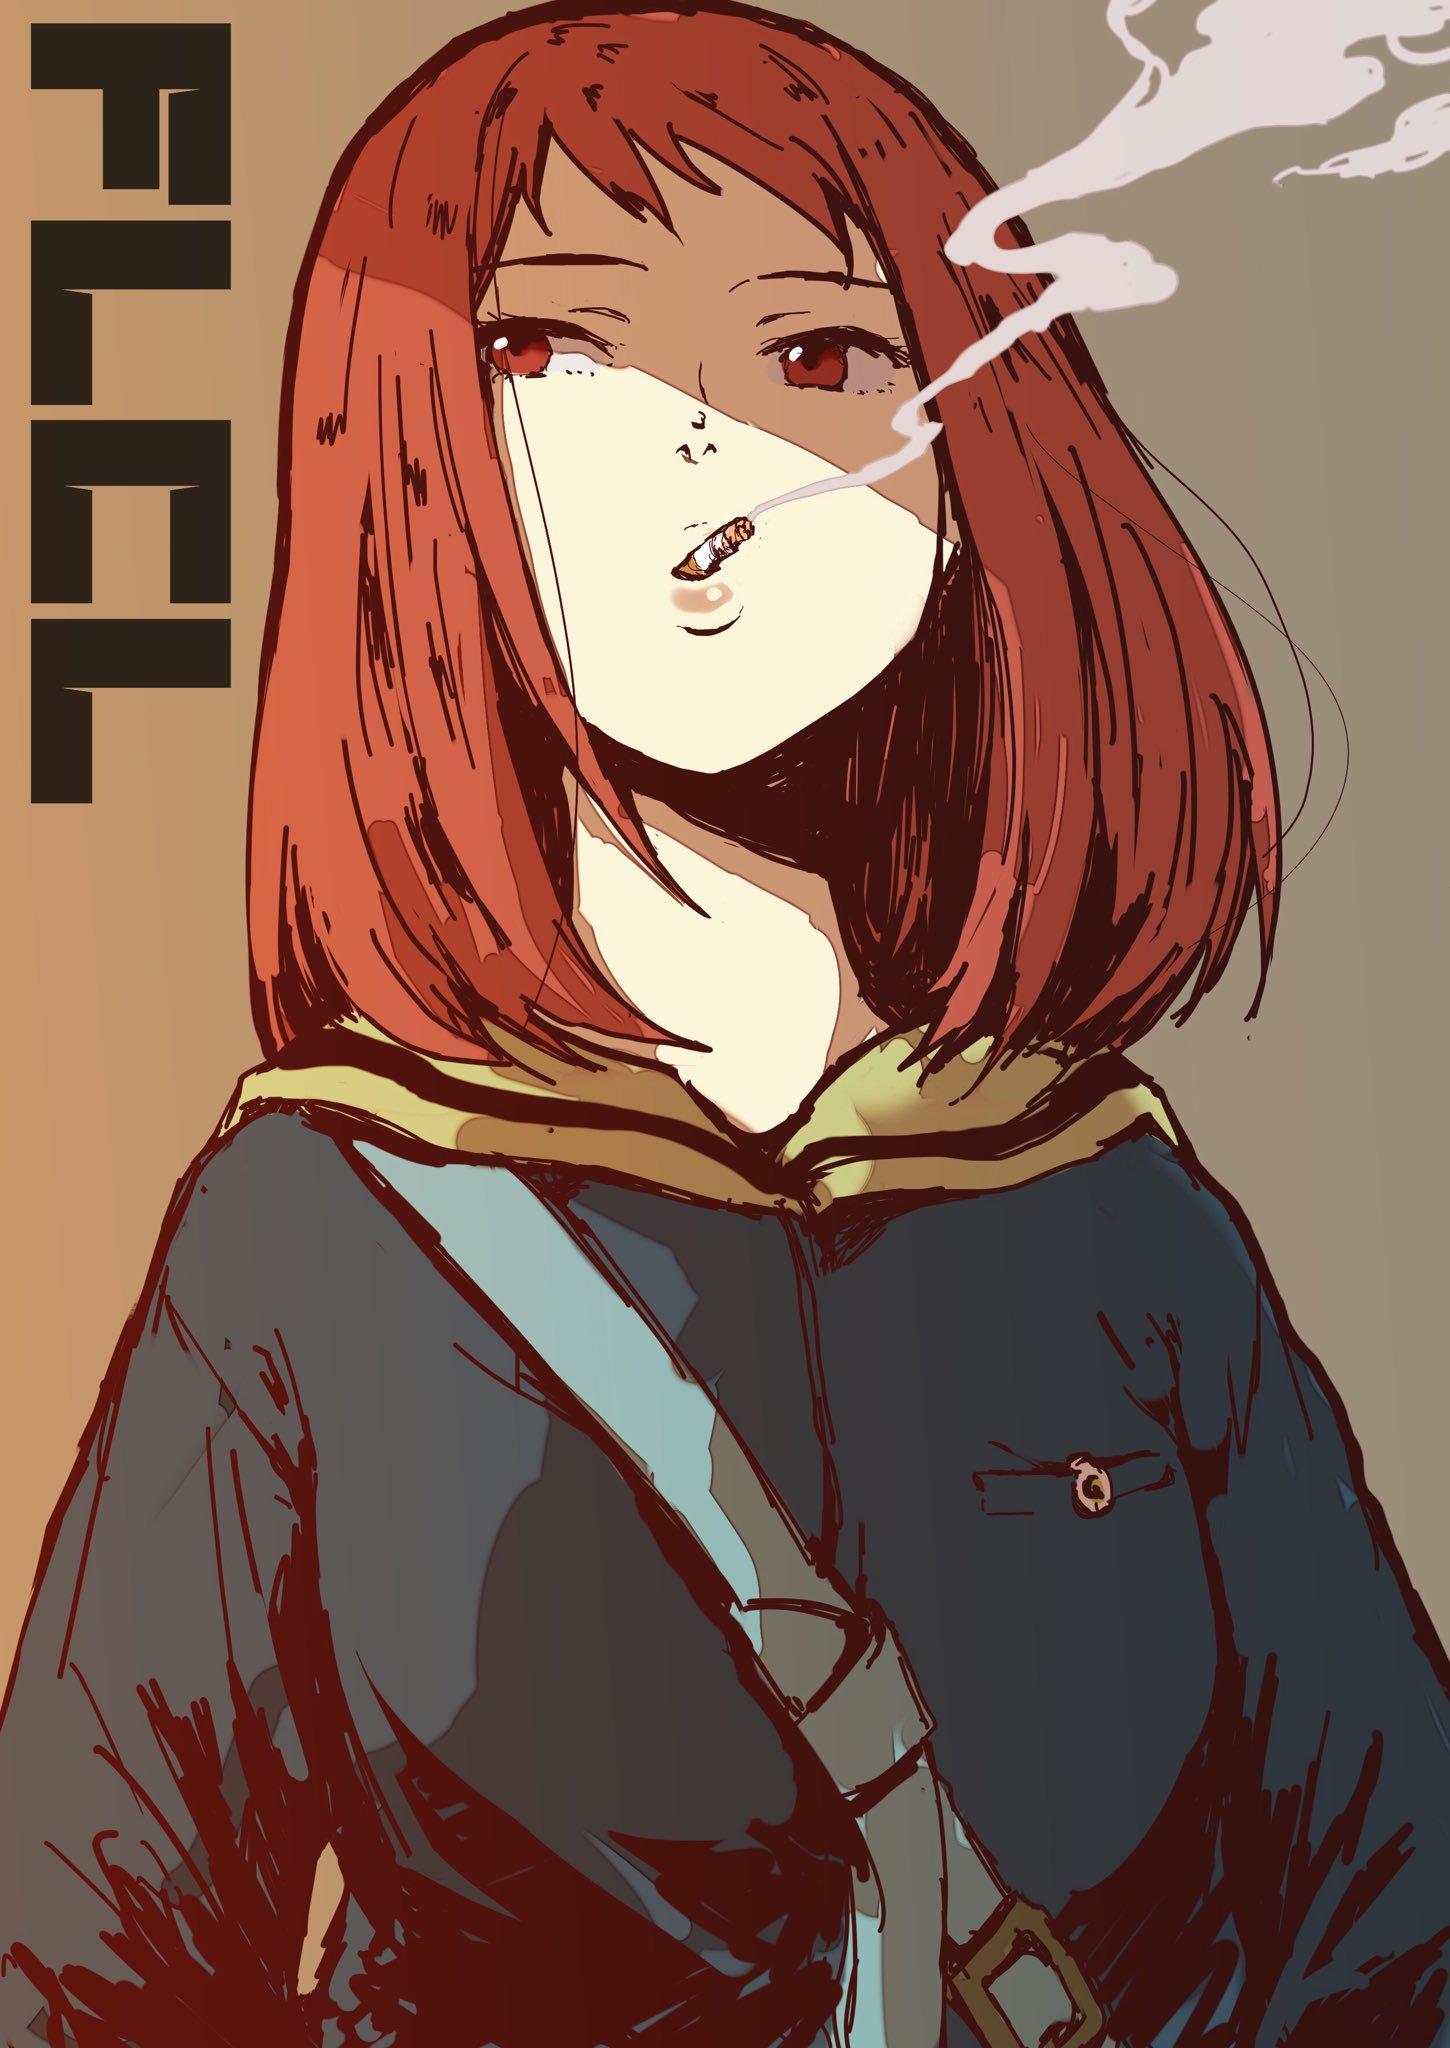 https://c.wallhere.com/photos/99/17/FLCL_anime_girls_Samejima_Mamimi-1294523.jpg!d